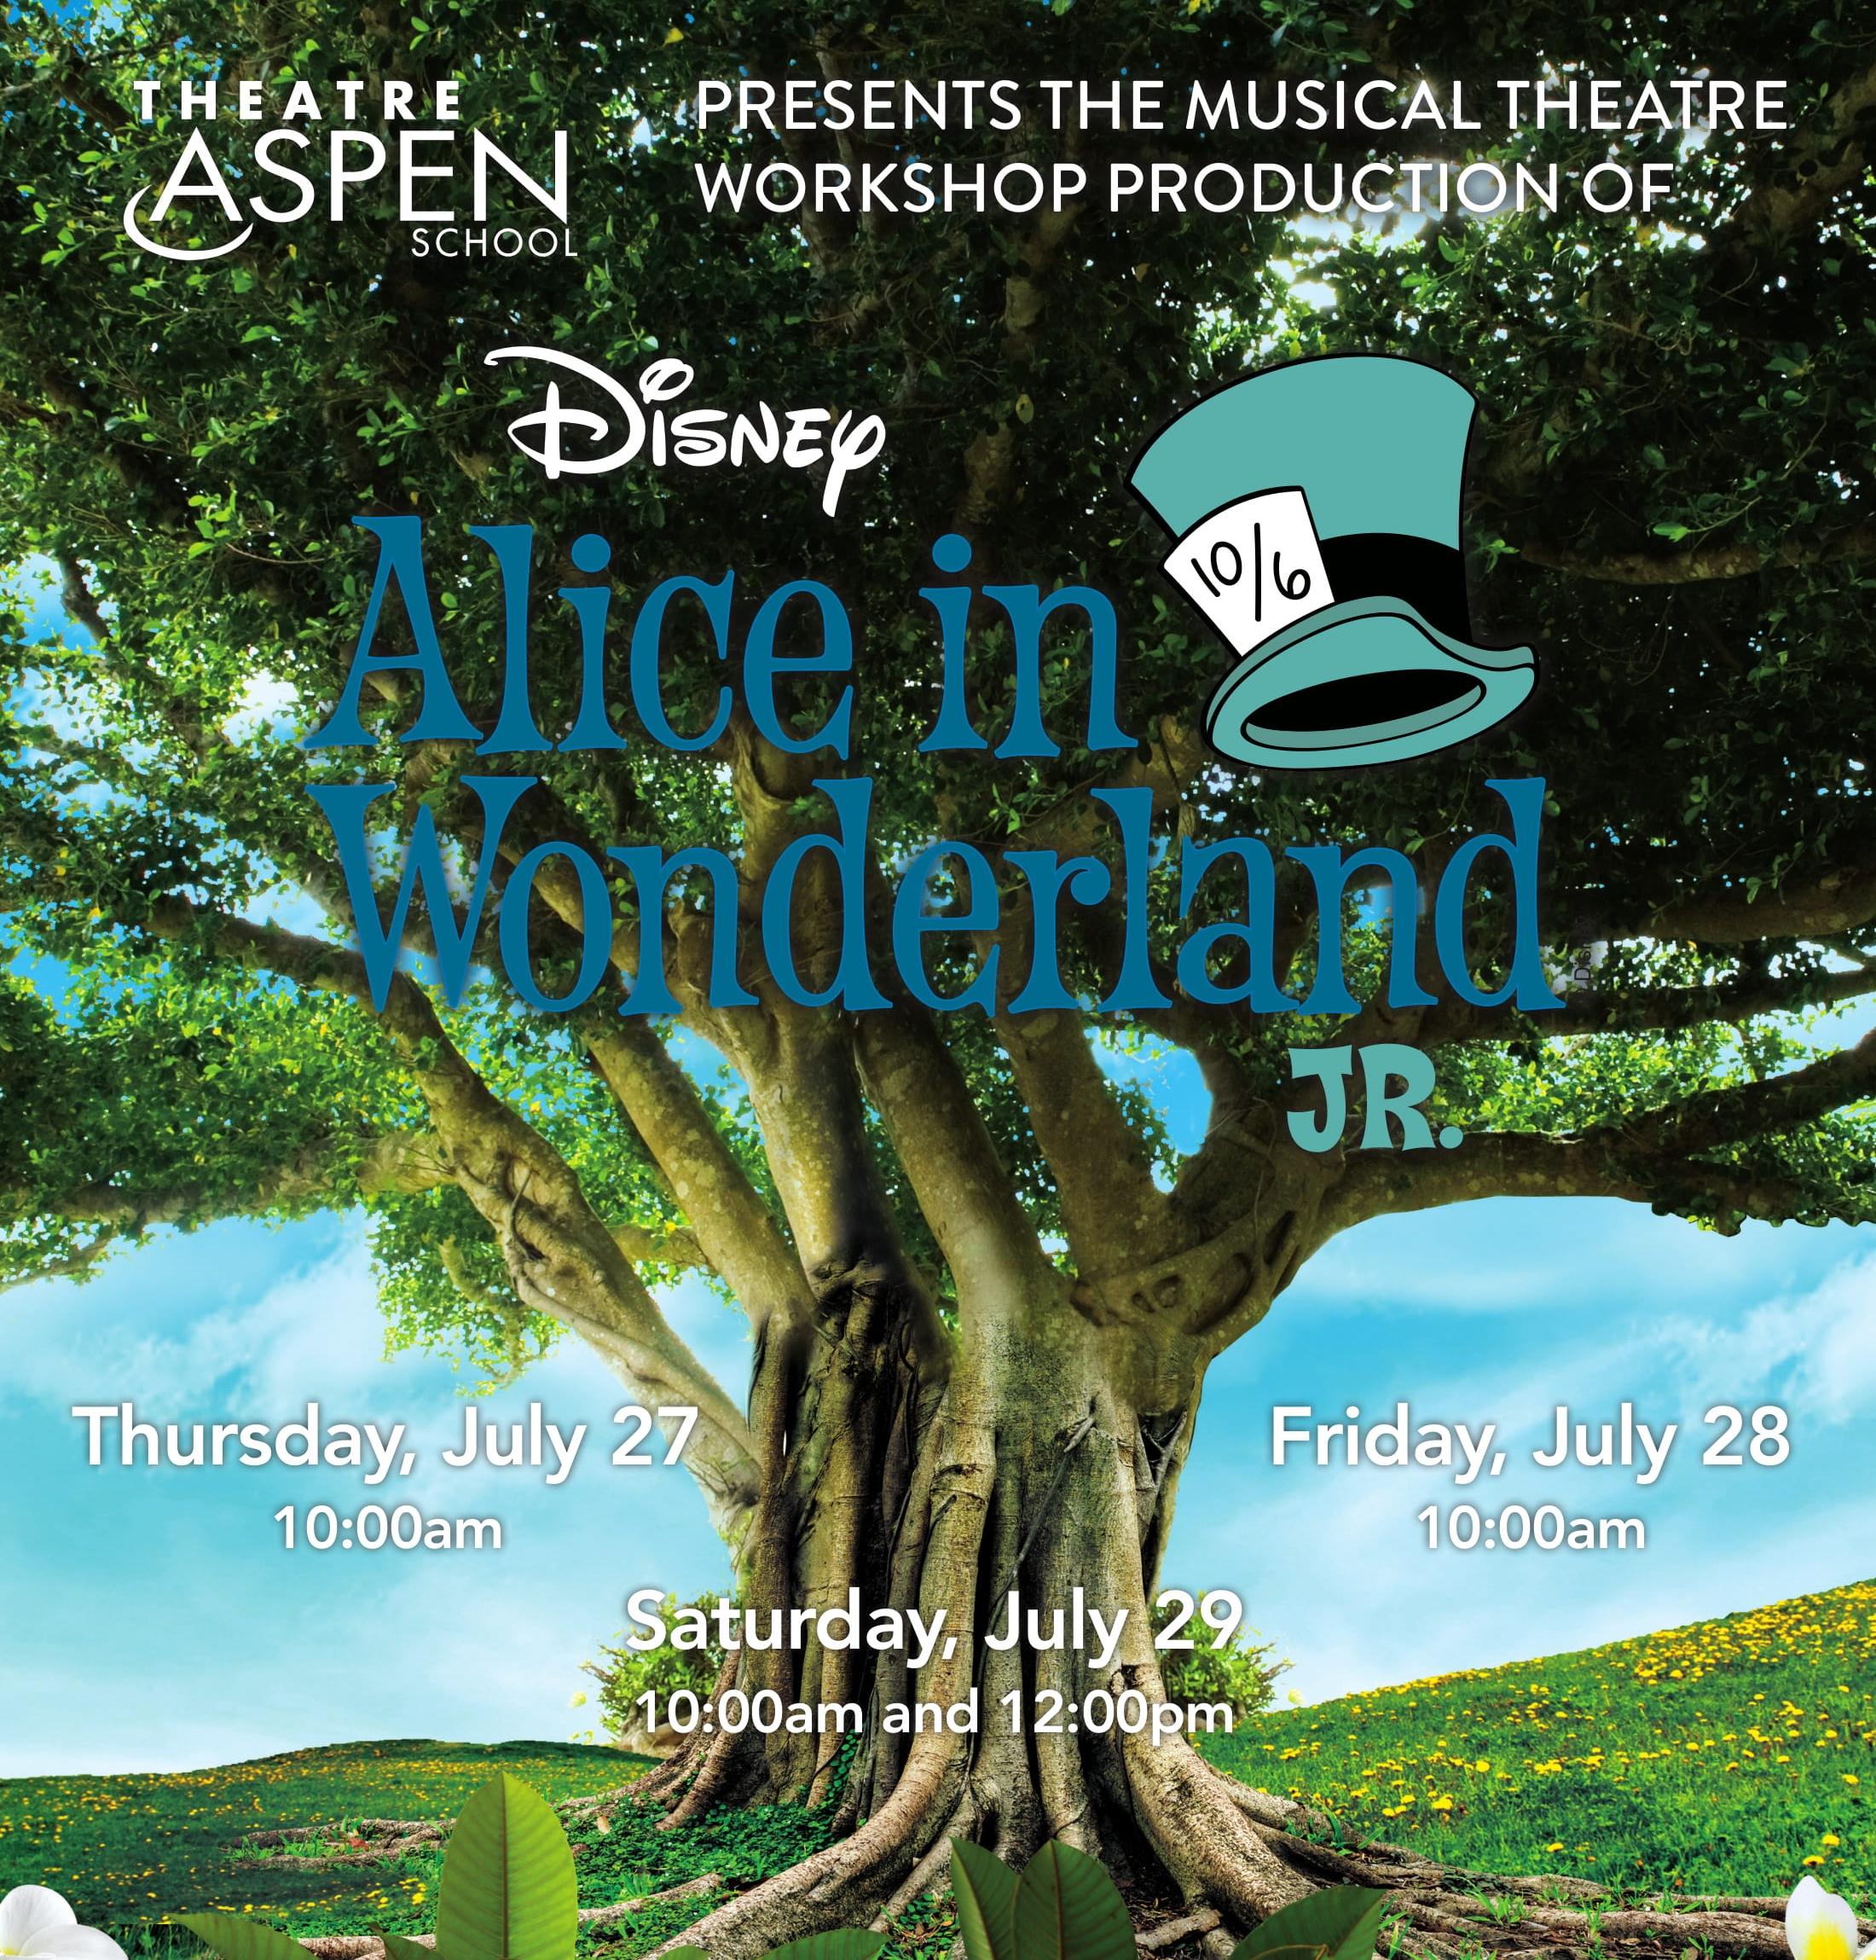 THE17-33-TAS Alice in Wonderland Poster 1.2-1.jpg